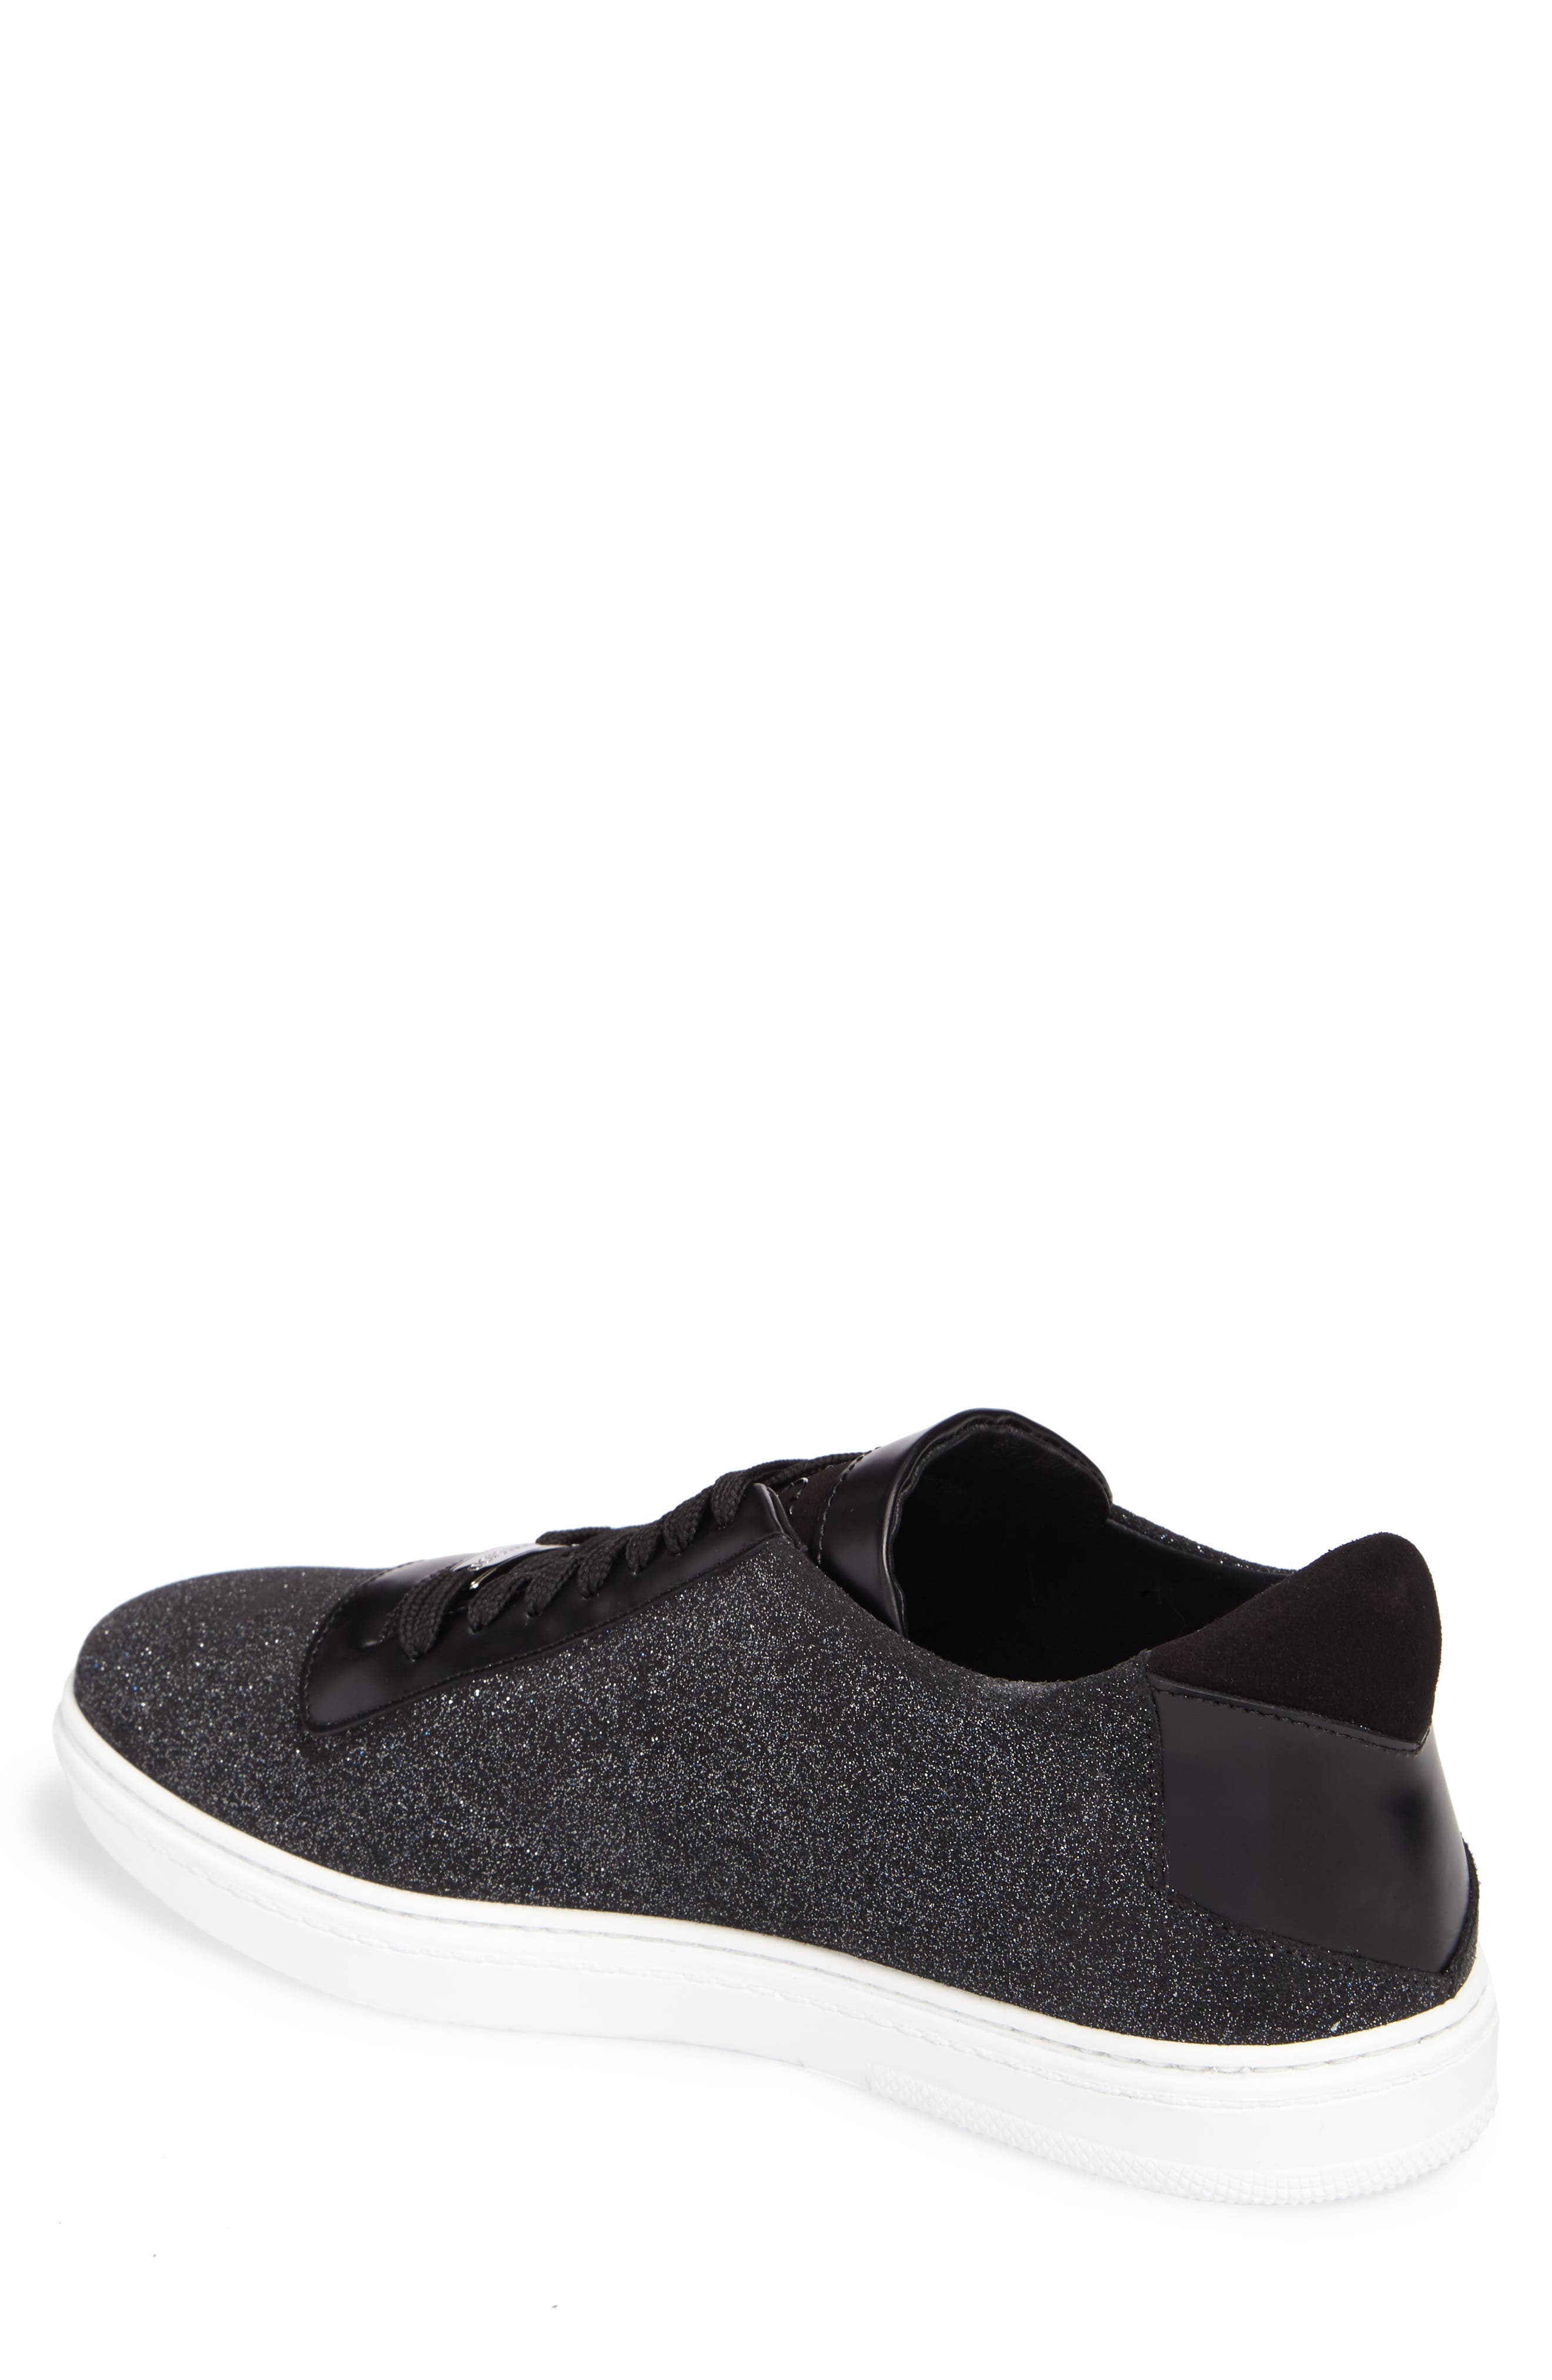 Benn Glitter Low Top Sneaker,                             Alternate thumbnail 2, color,                             Smoky Blue